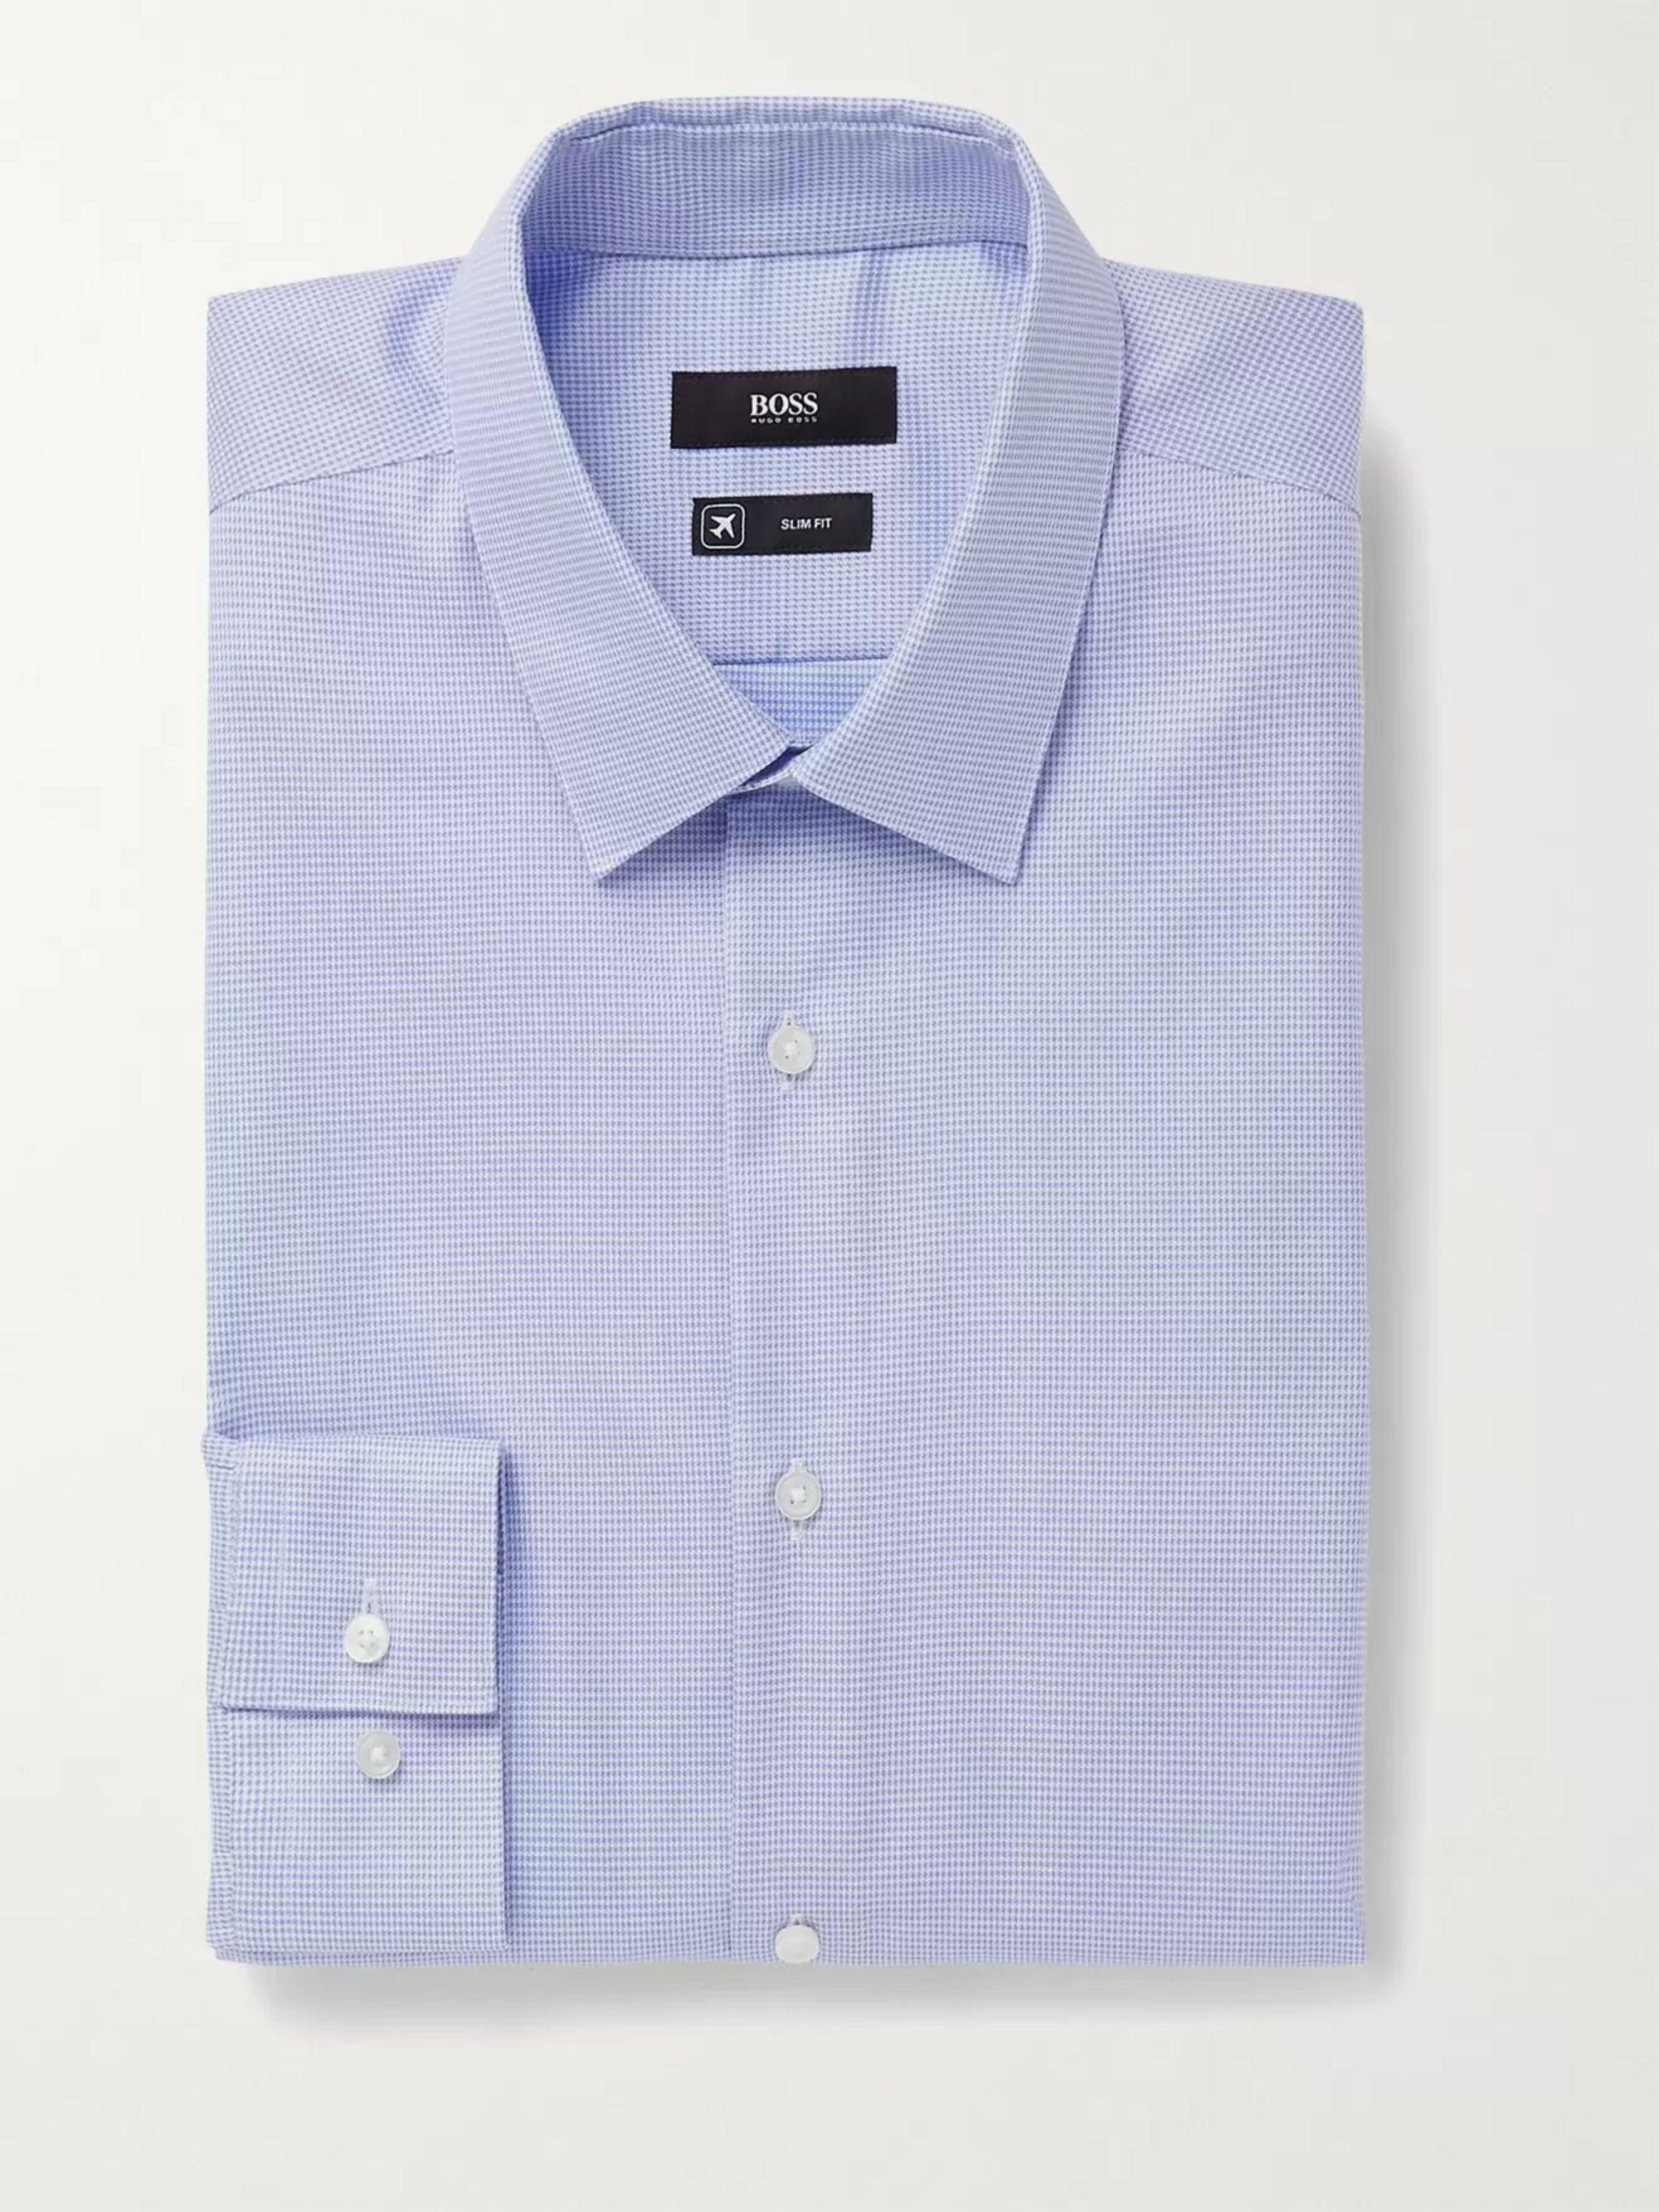 HUGO BOSS Isko Slim-Fit Houndstooth Cotton Shirt